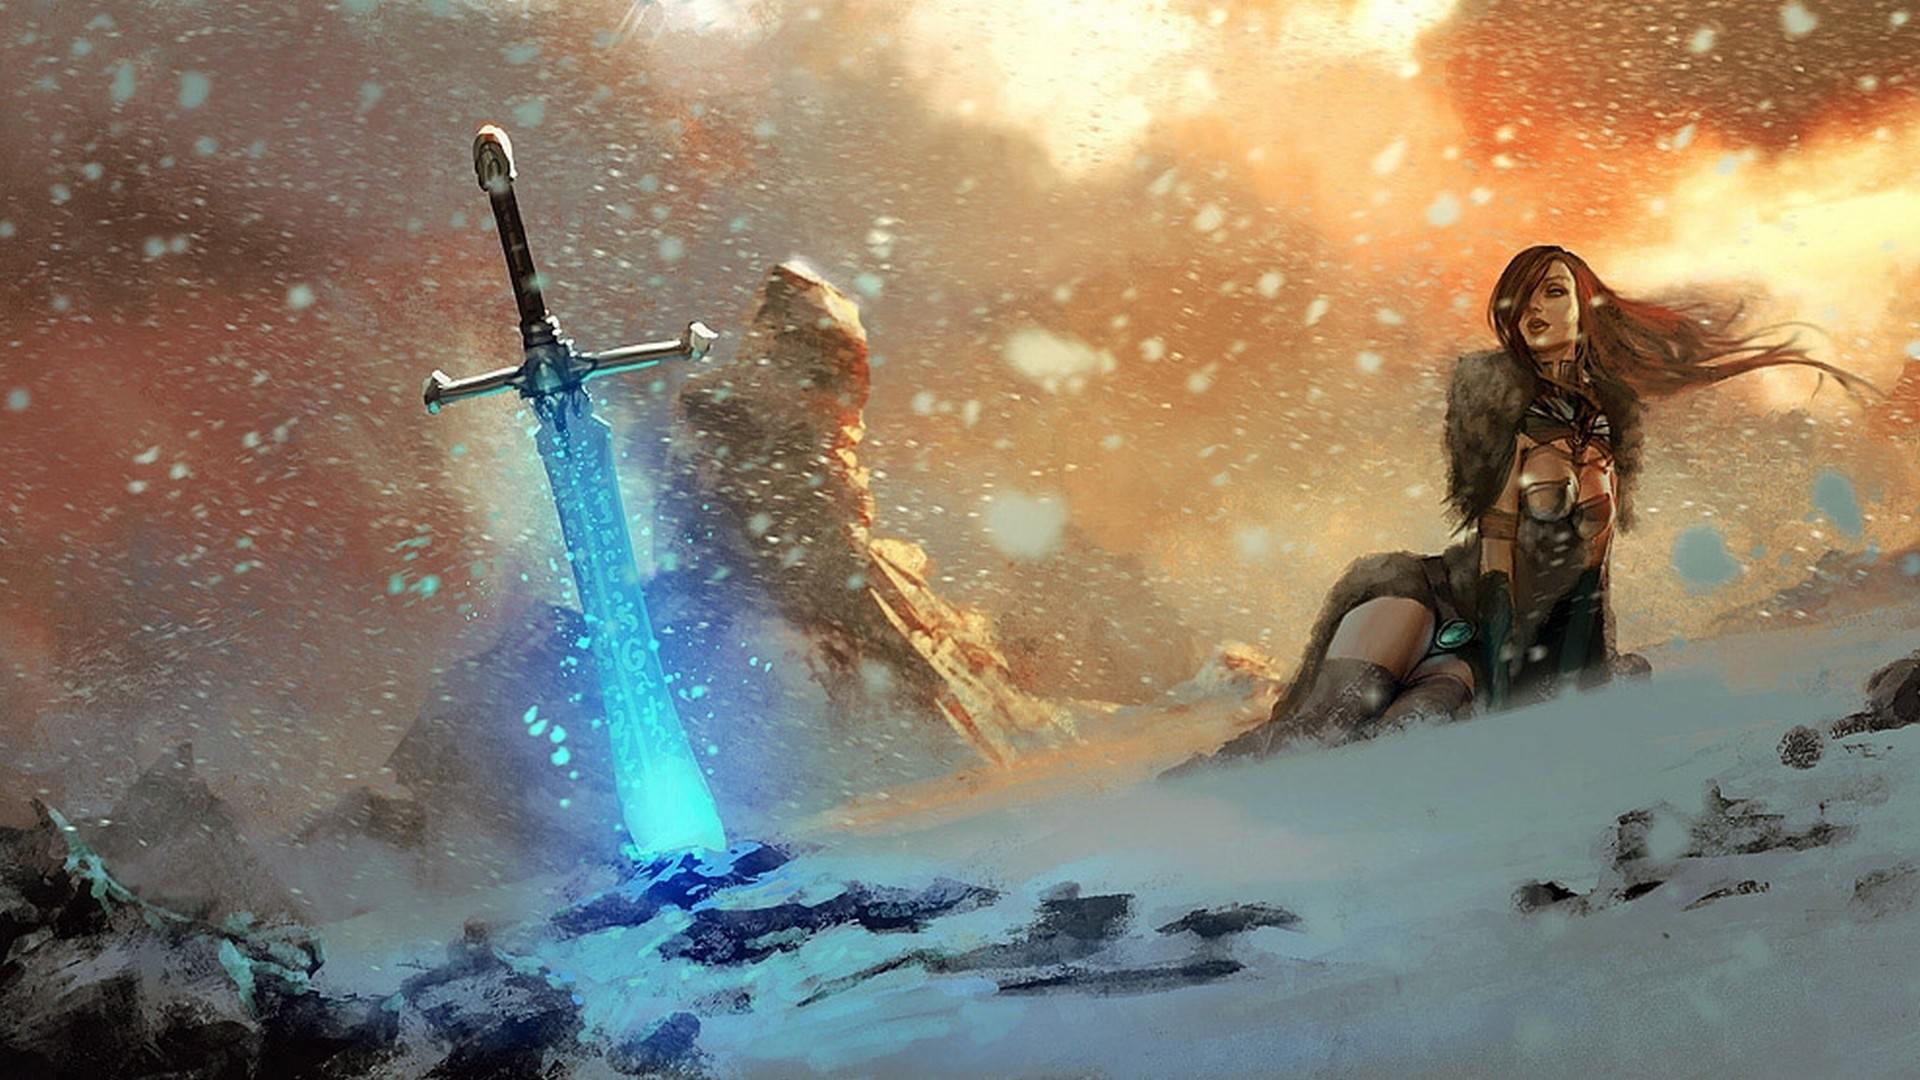 fantasy-art-magic-mountain-female-sword-wallpaper